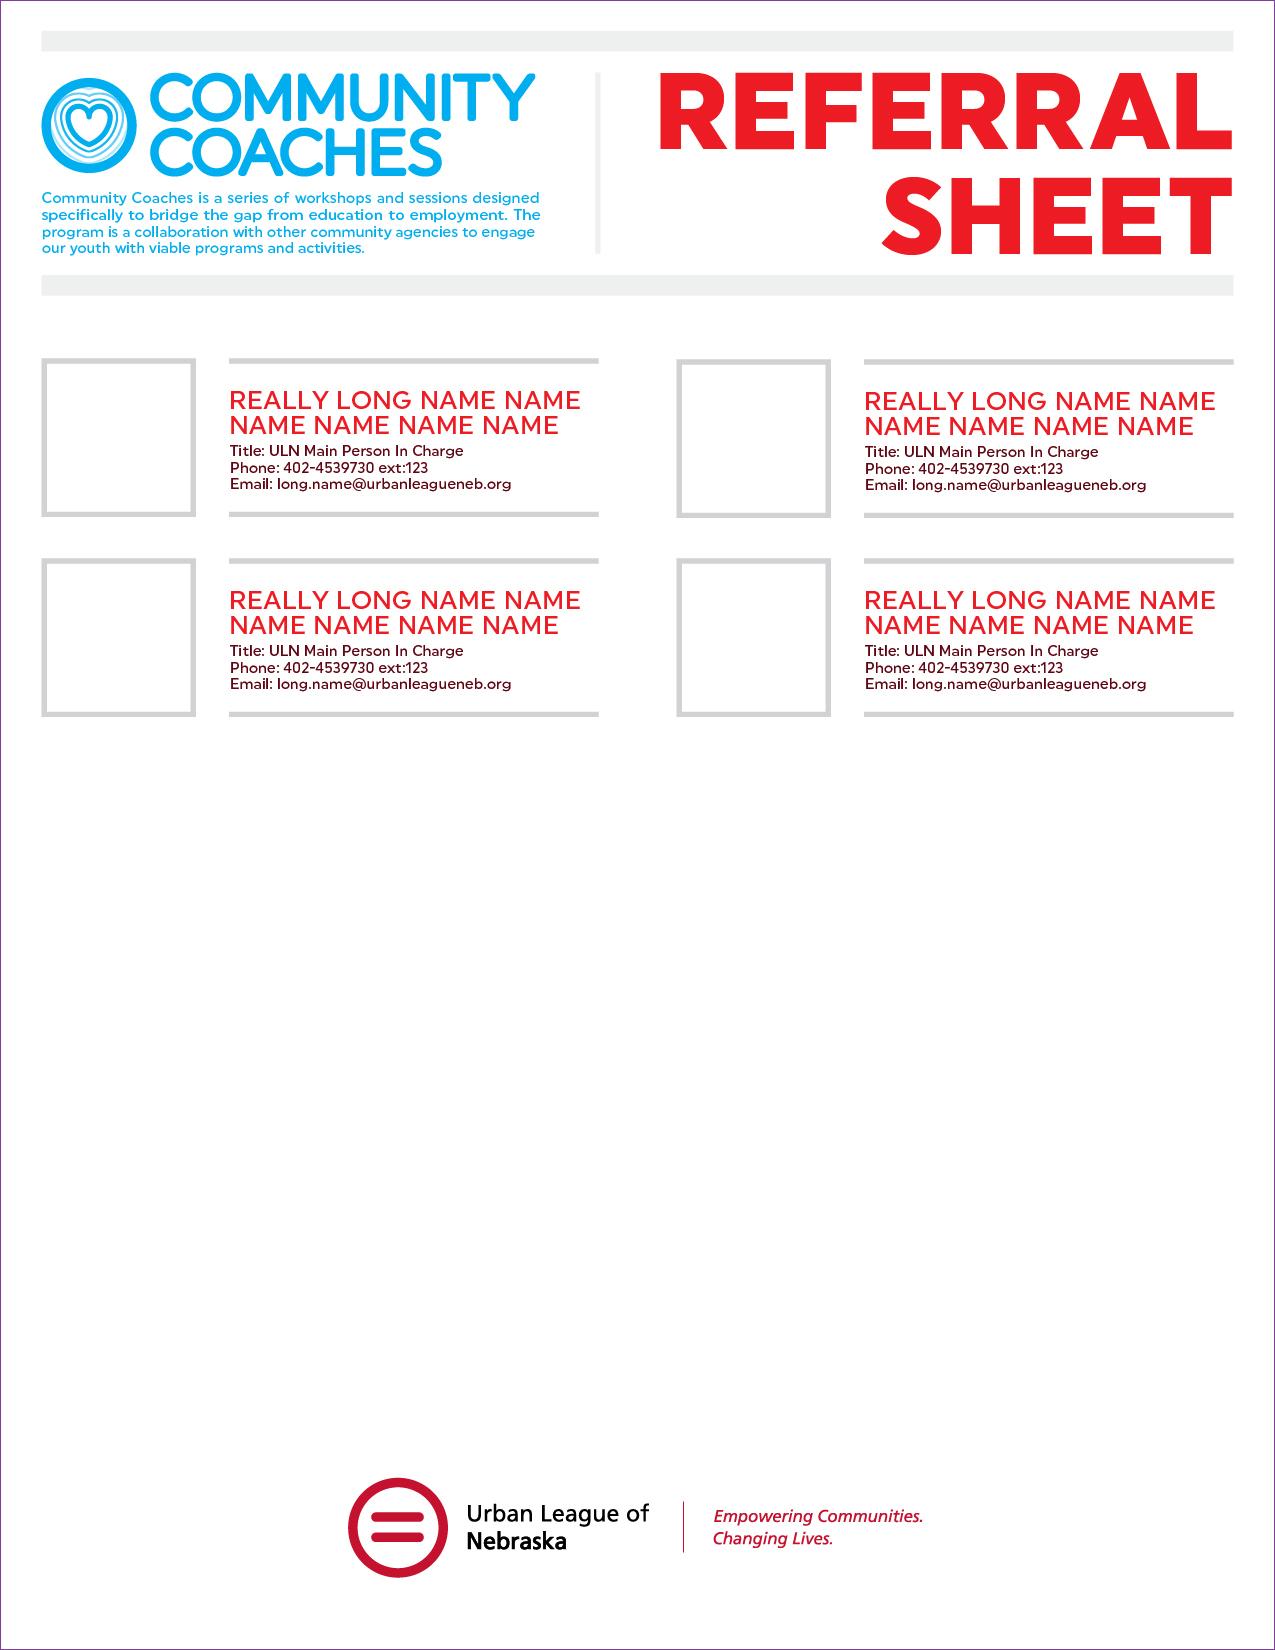 Referral Sheet -